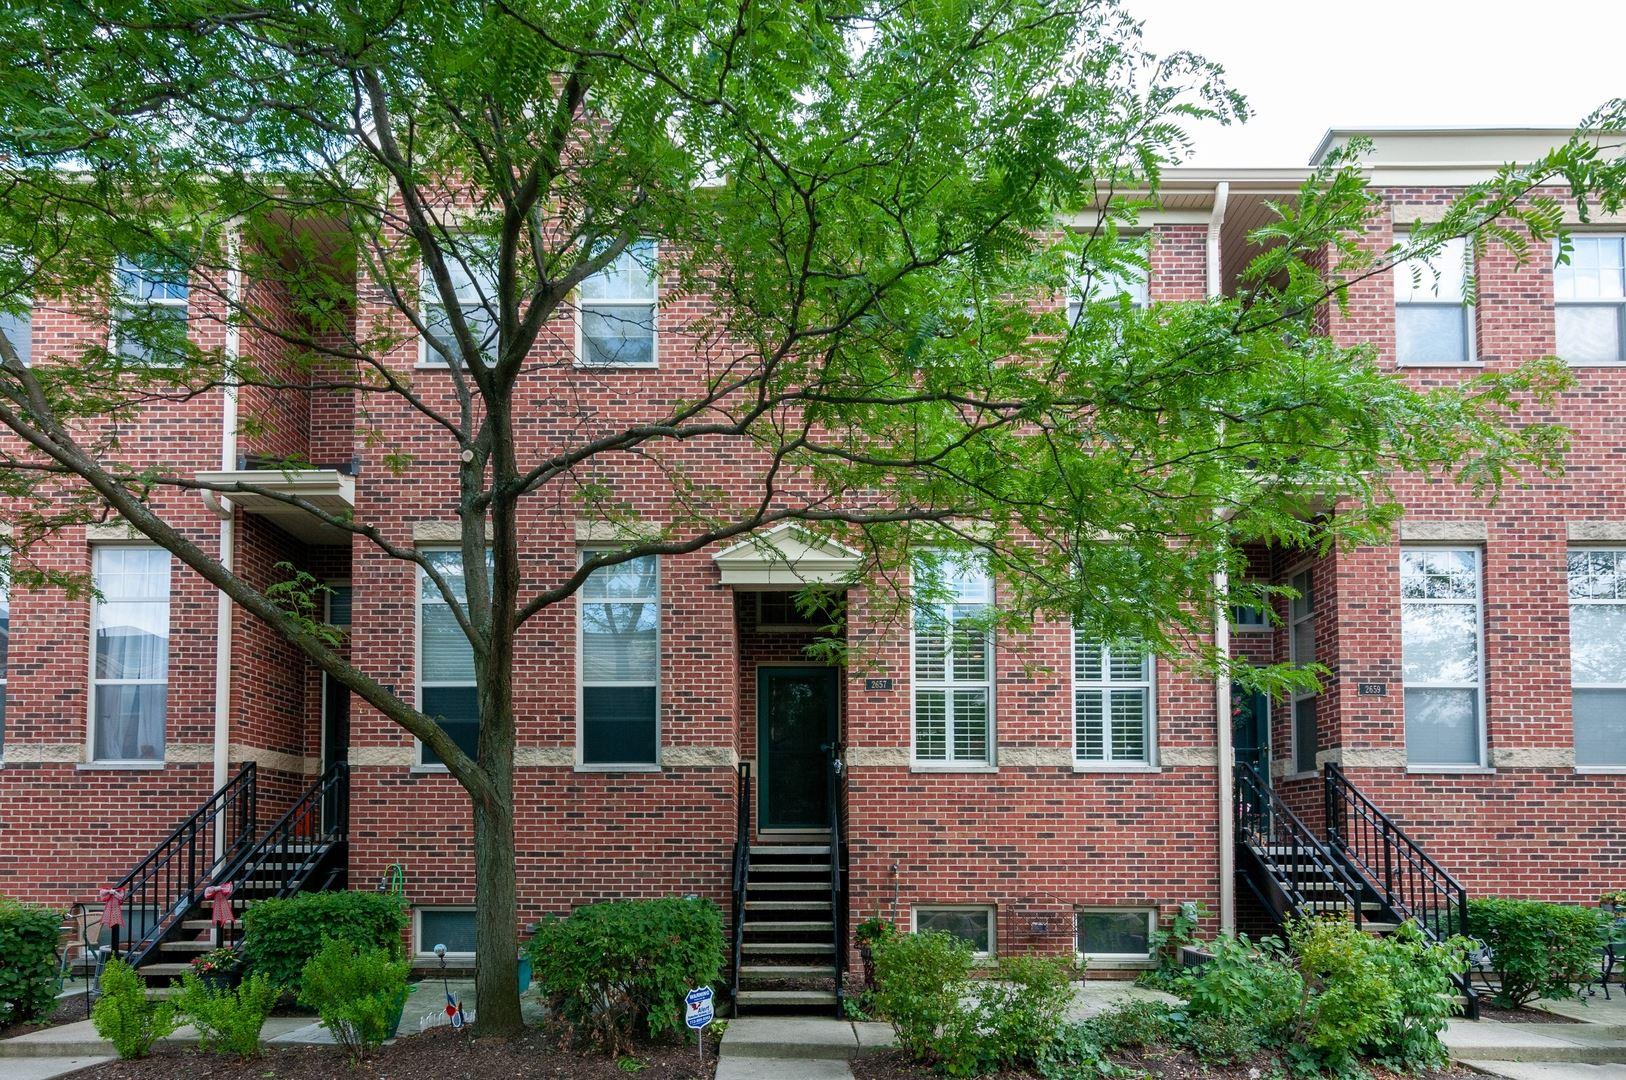 2657 W Melrose Street, Chicago, IL 60618 - #: 10800936